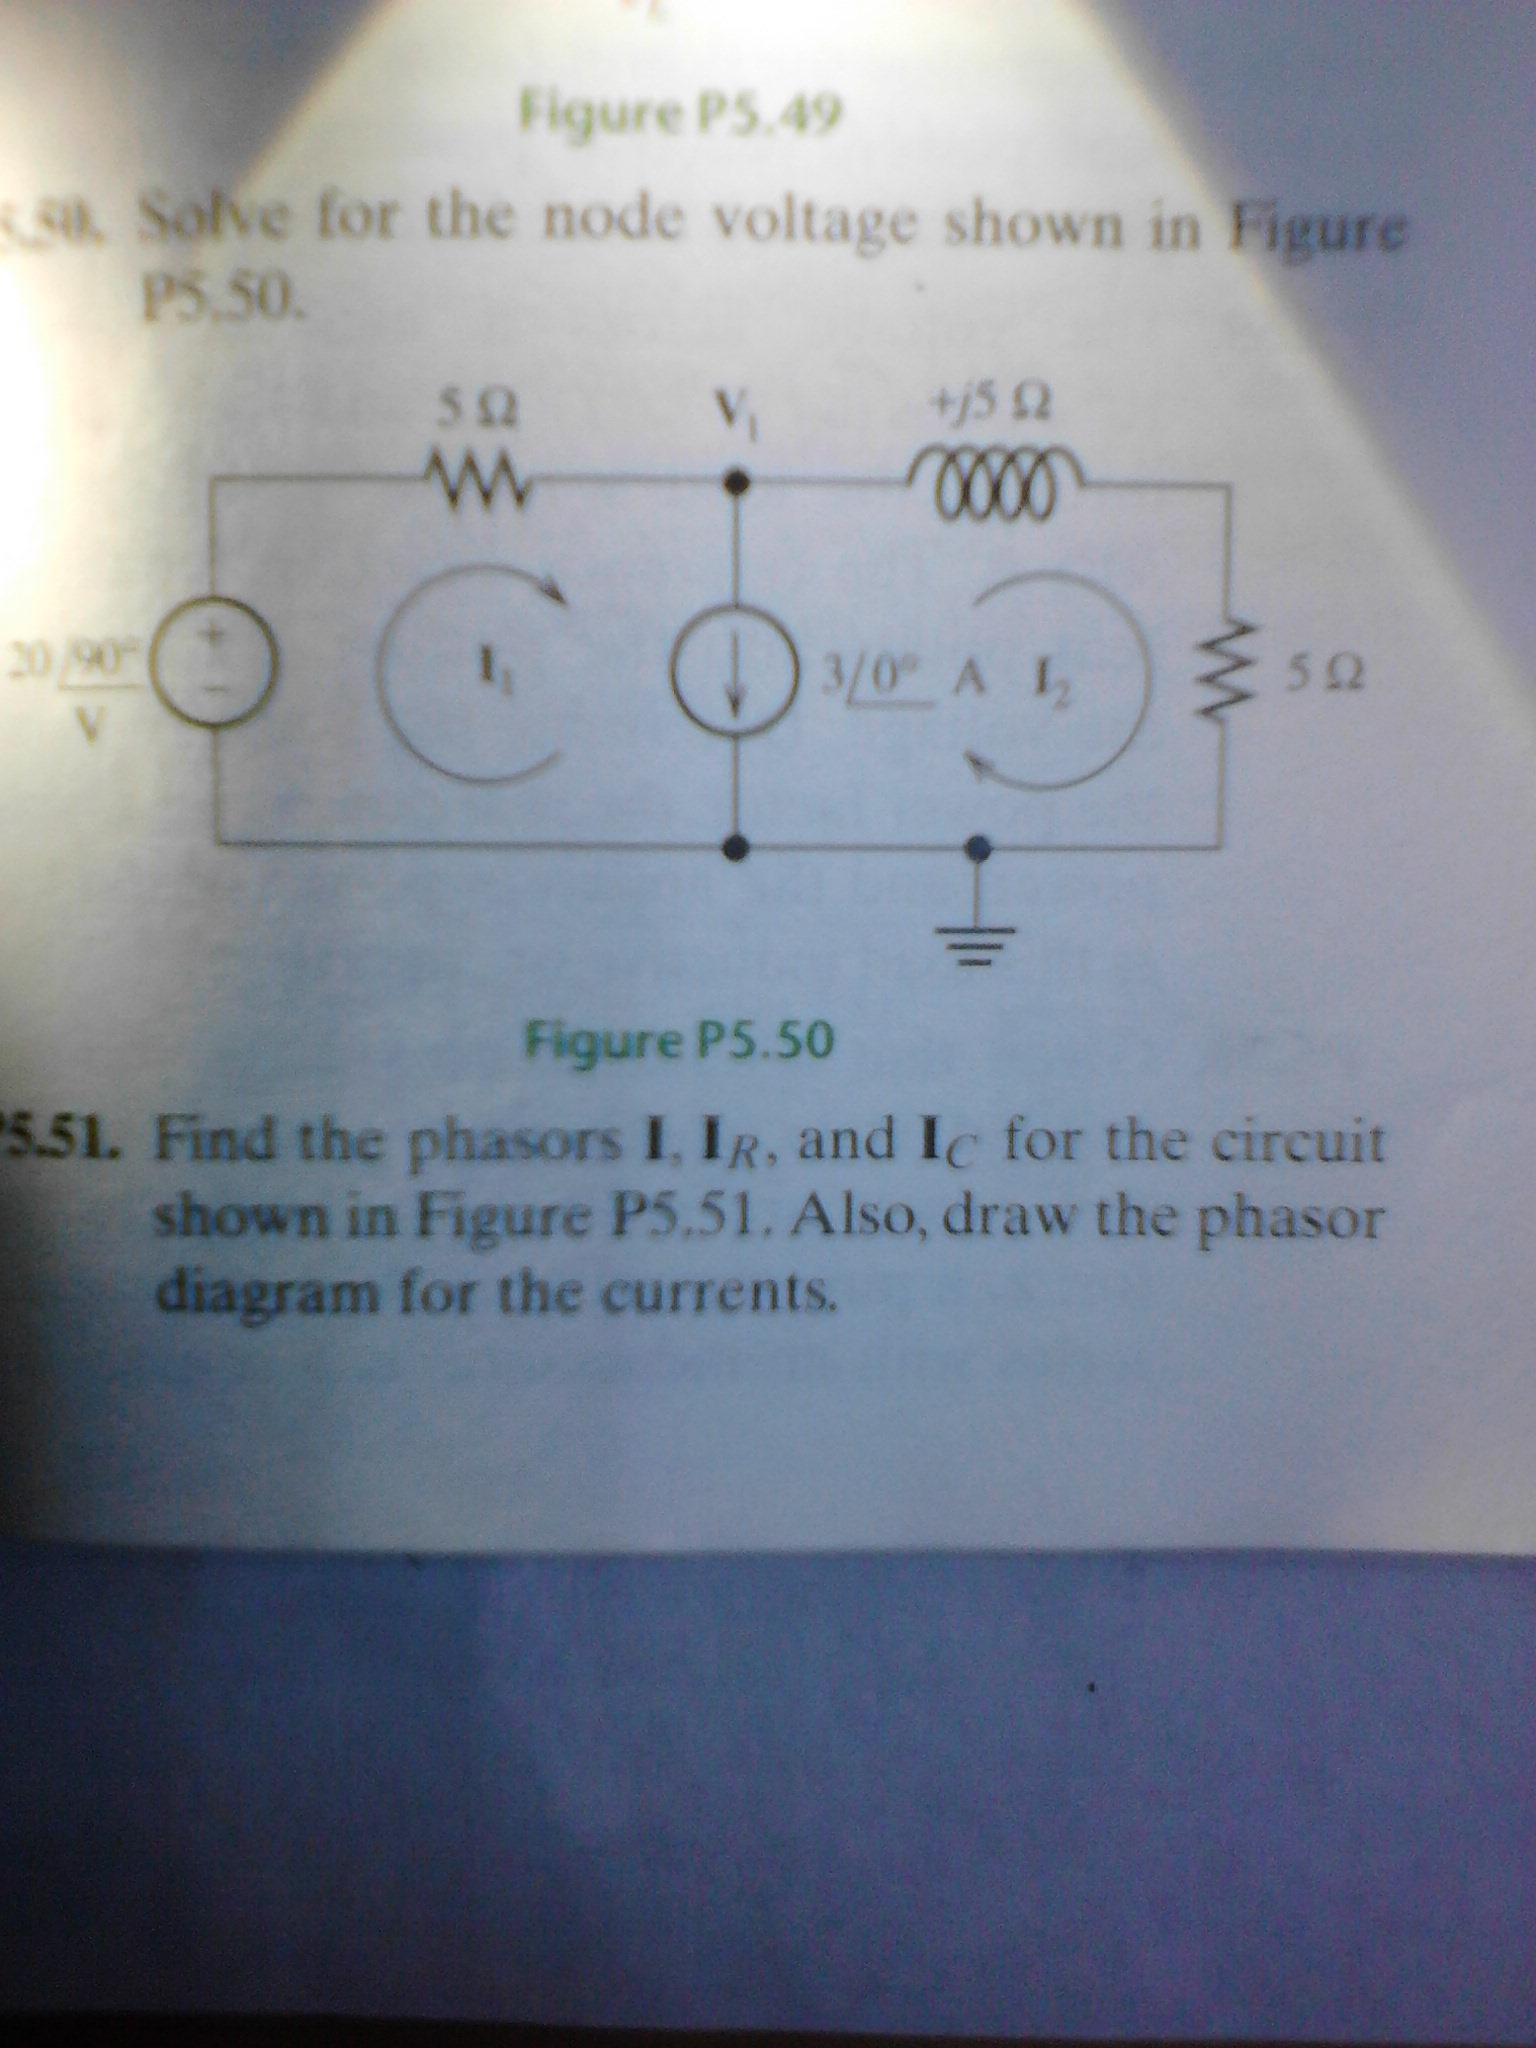 Draw Phasor Diagram Online Solve For The Node Voltage Shown Figure P